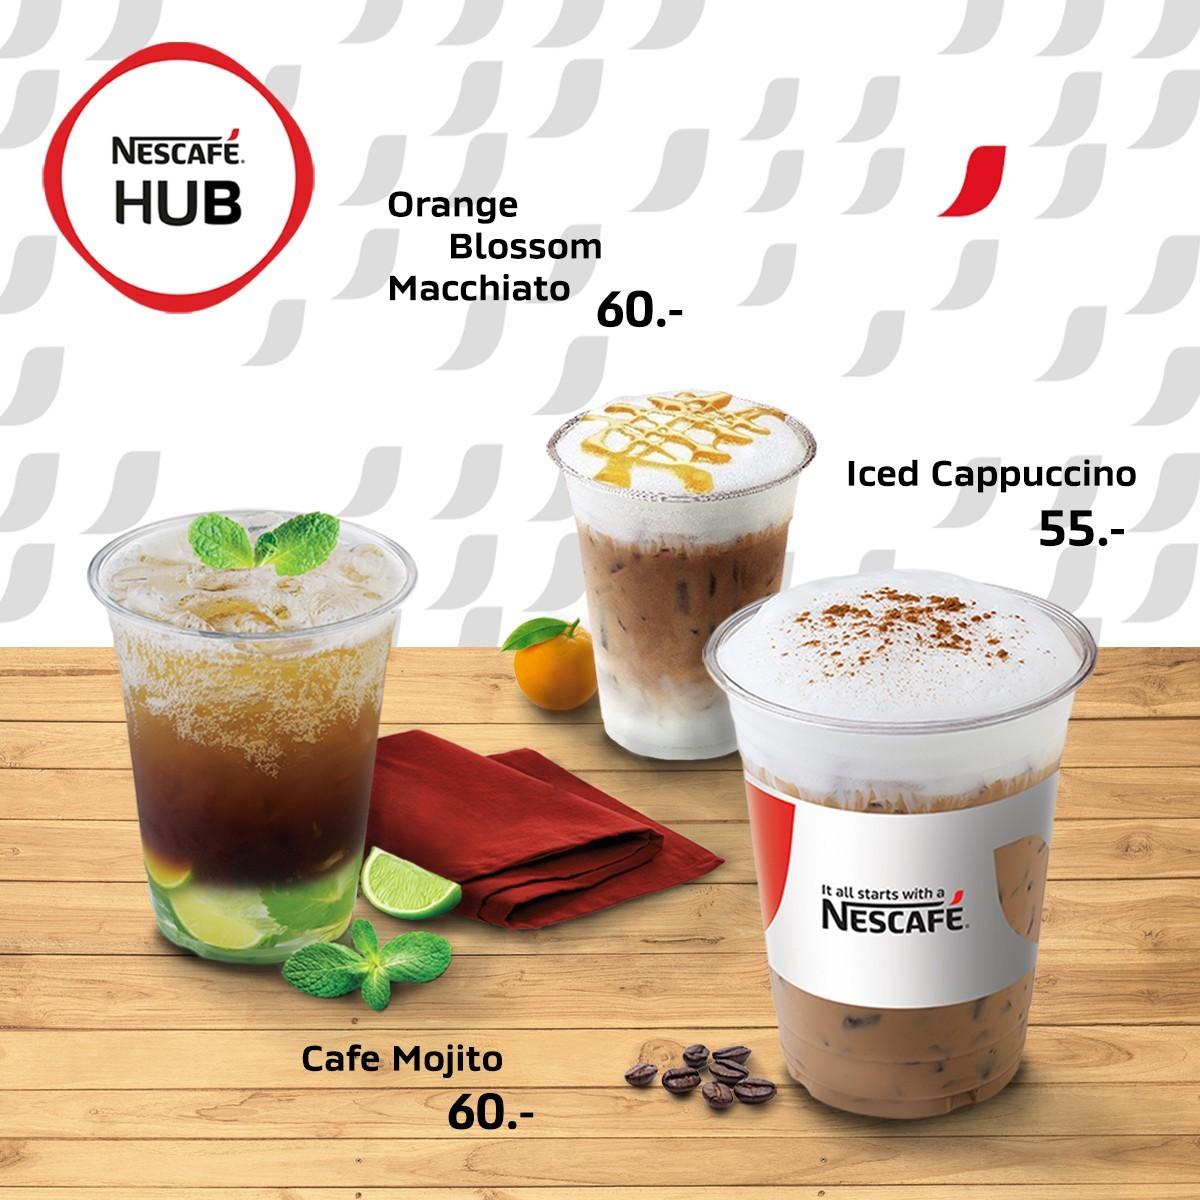 Nescafe Hub